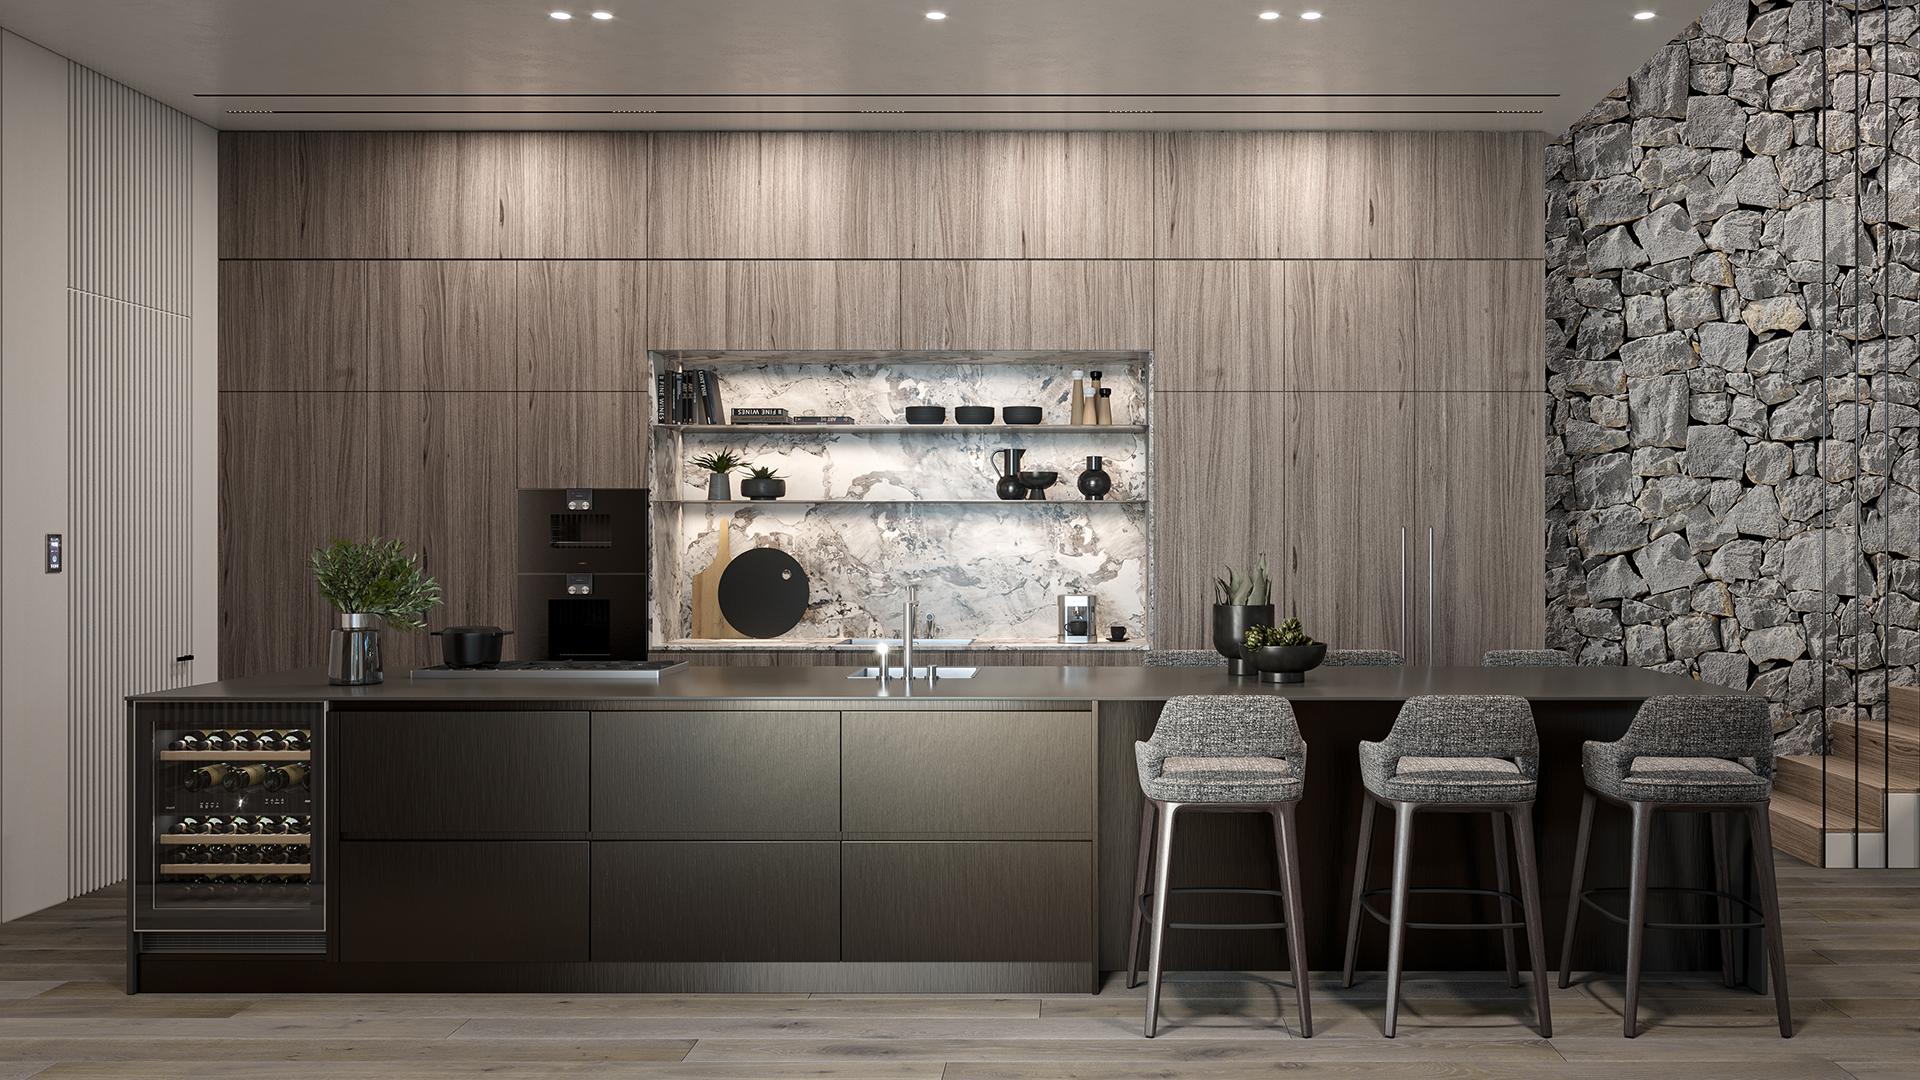 Maayan-Golan_Architectural-Visualization_interior-render_private-residential_kitchen_interior-design-by-sharon-maayan_01